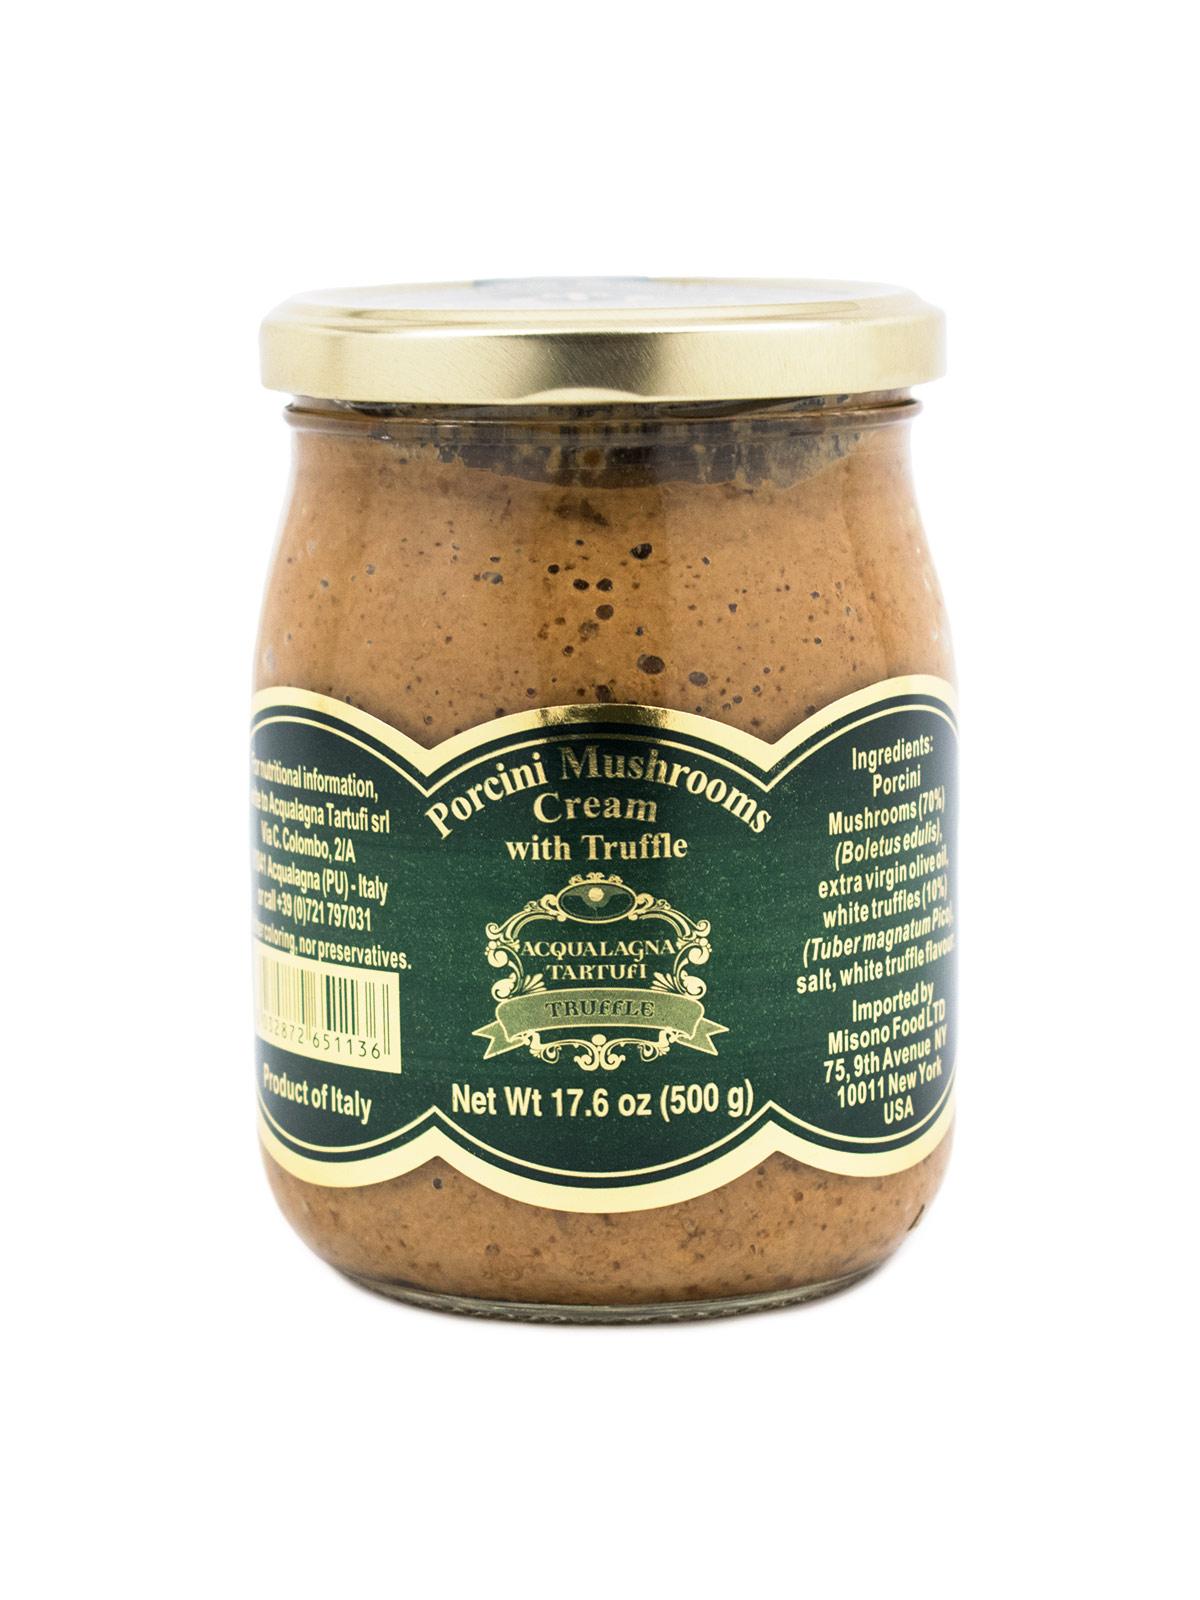 Truffle Porcini Mushroom Cream - Truffles - Buon'Italia